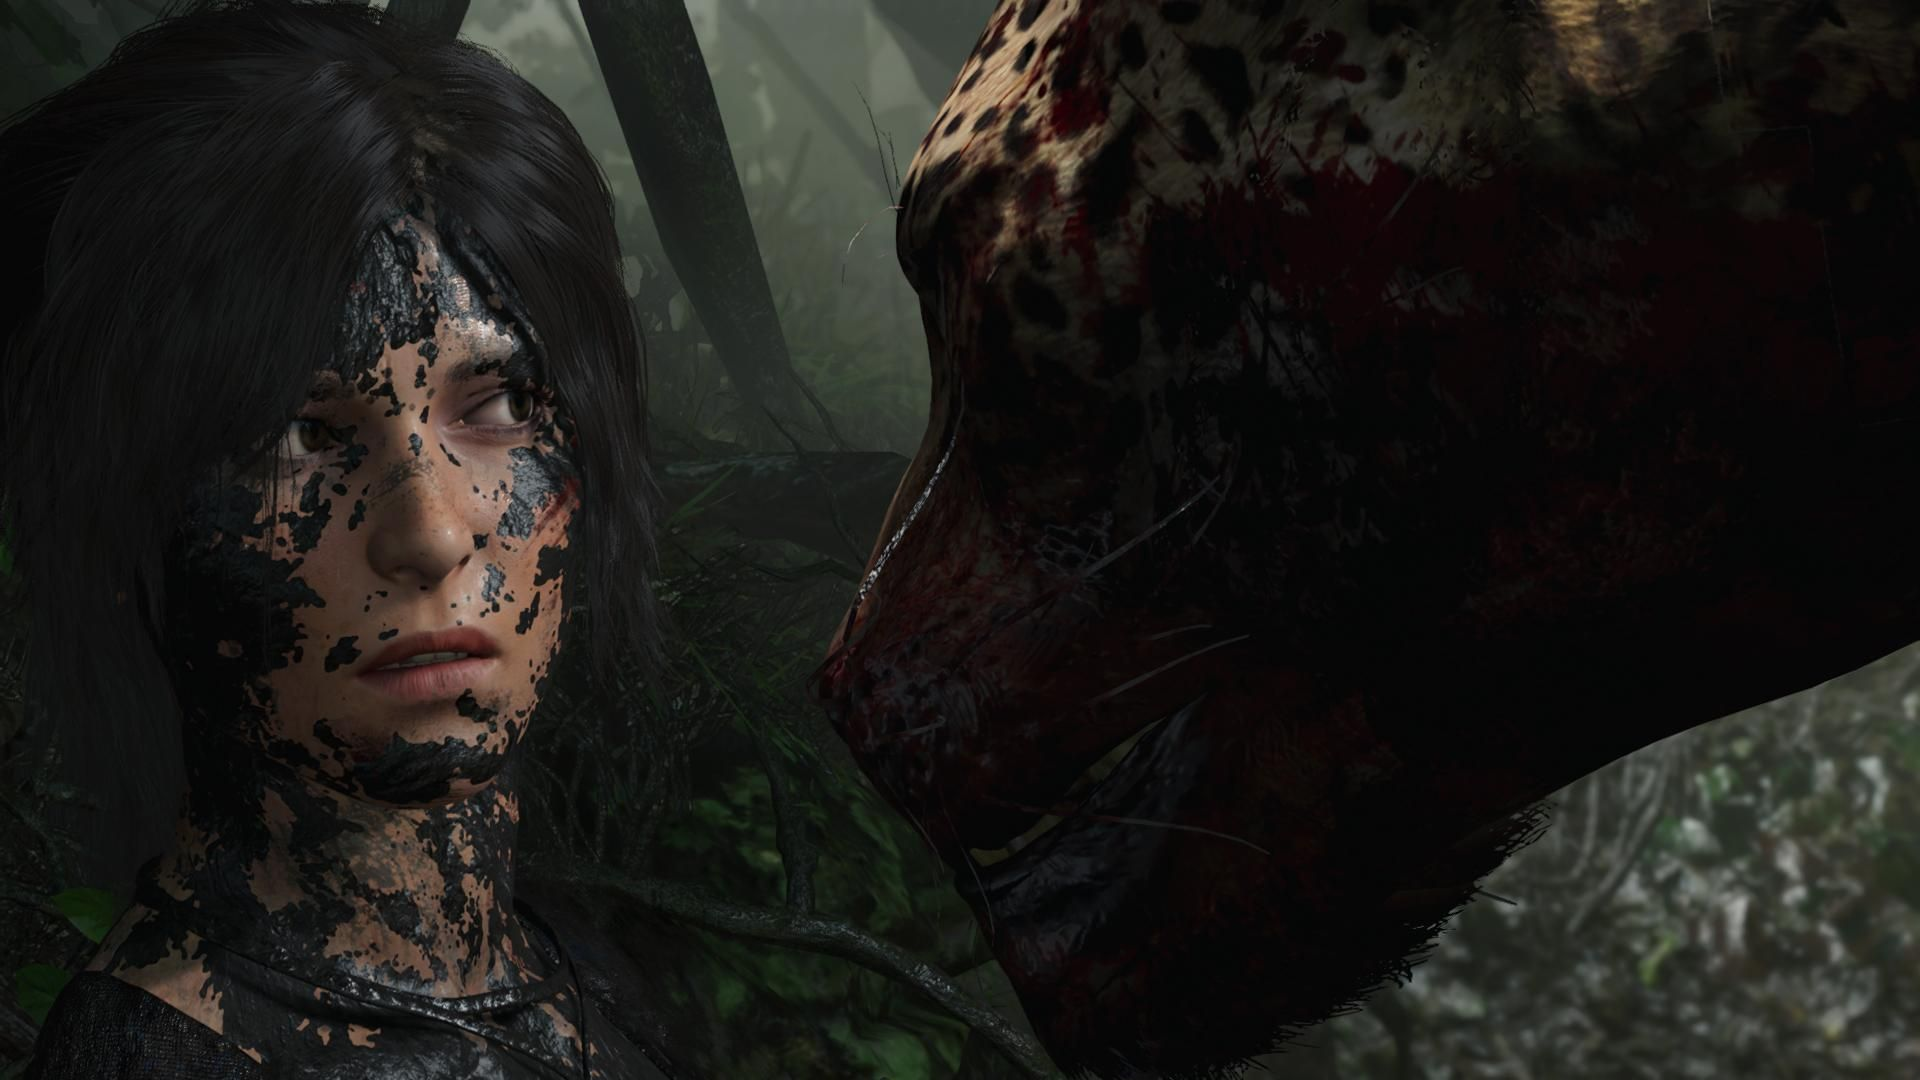 SOTTR 2018-10-19 12-51-01-10.jpg - Shadow of the Tomb Raider